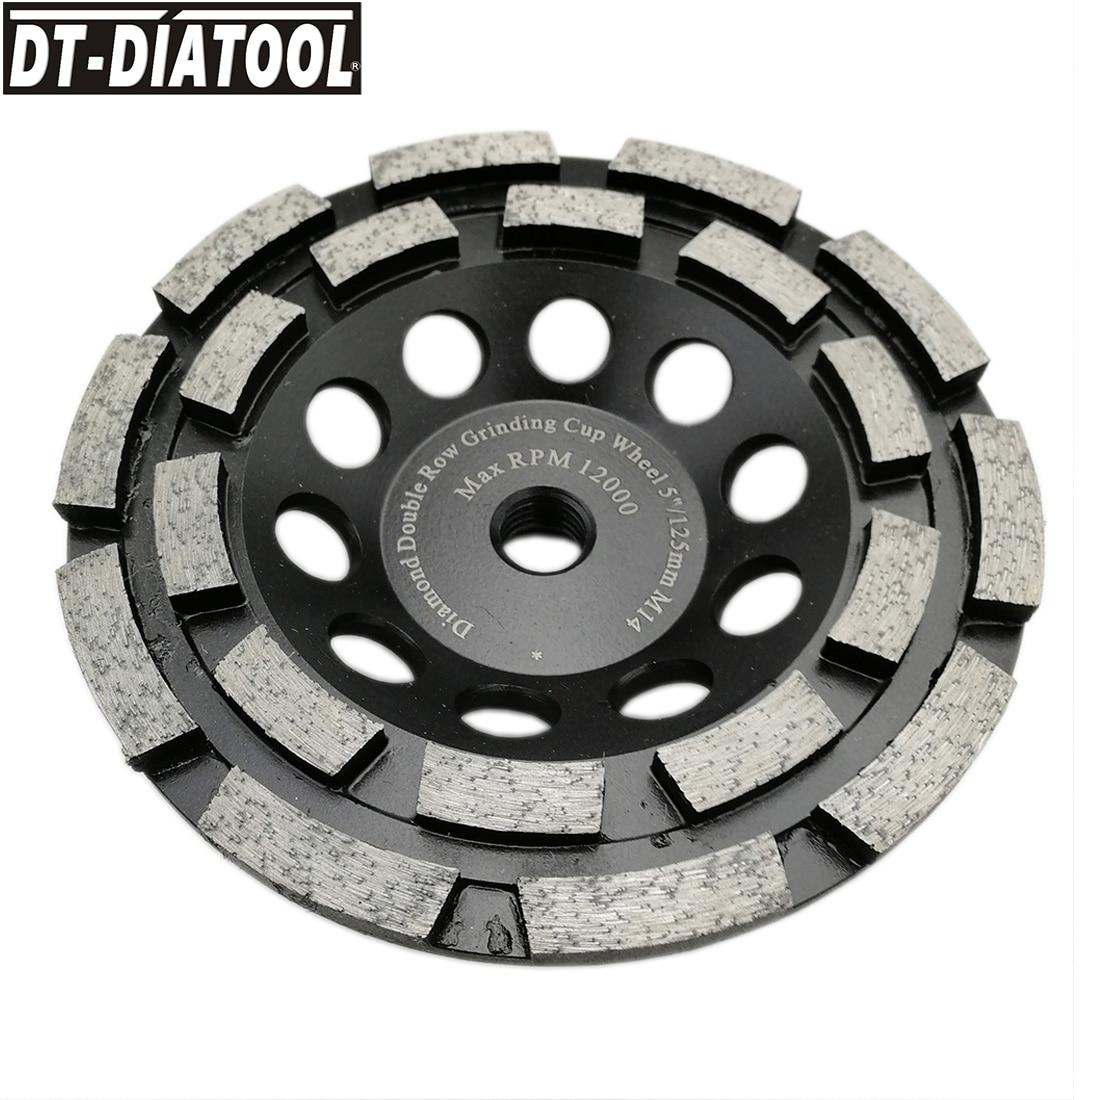 DT DIATOOL 1piece Premium Diamond Double Row Cup Grinding Wheel for Concrete hard stone granite Dia